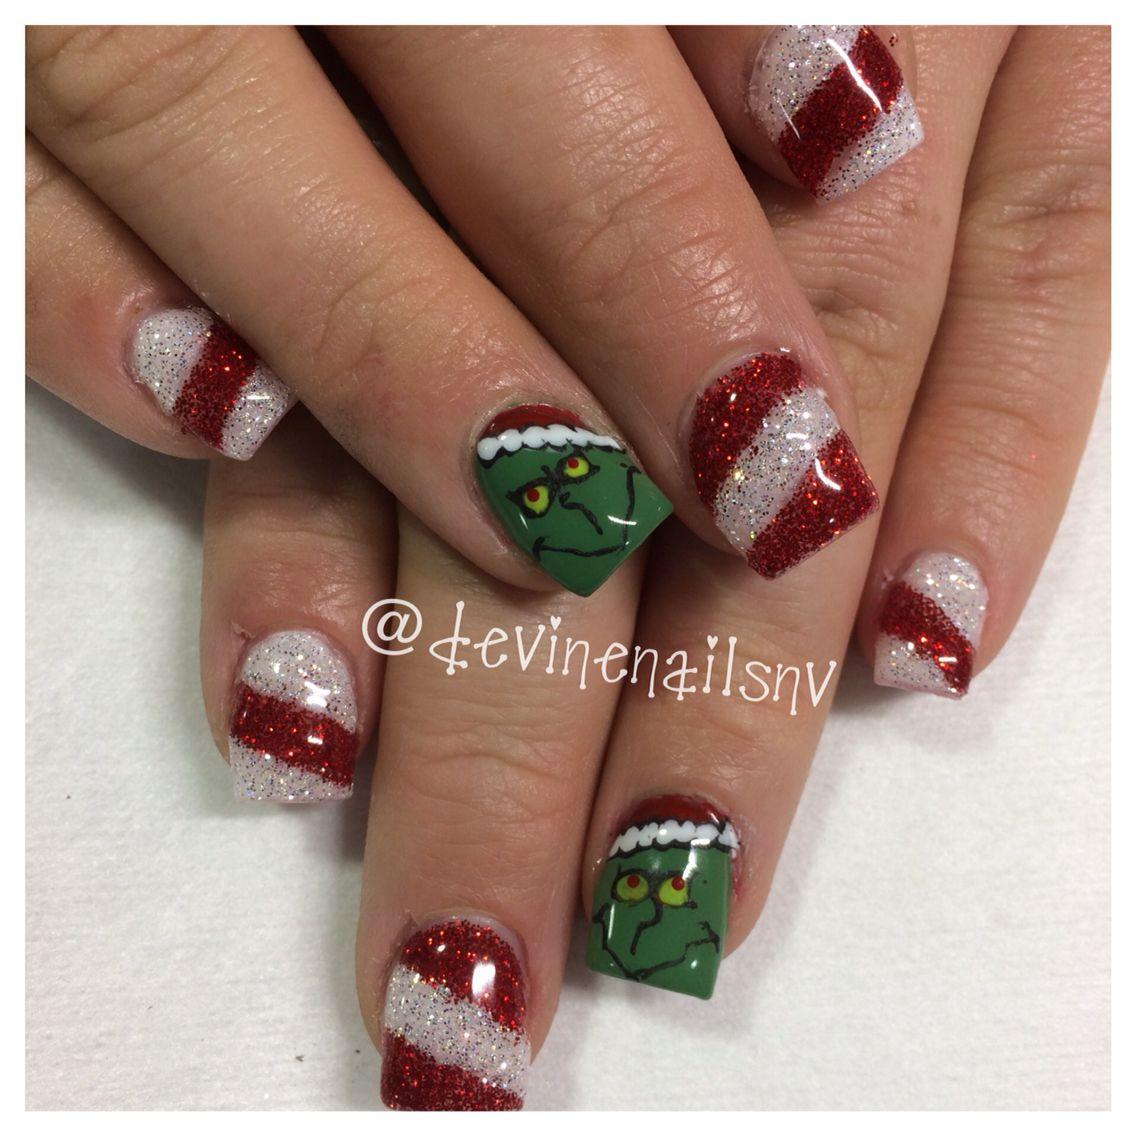 Grinch nails by Chelsea Devine @ Villaggio Salon Suites | Nails by ...